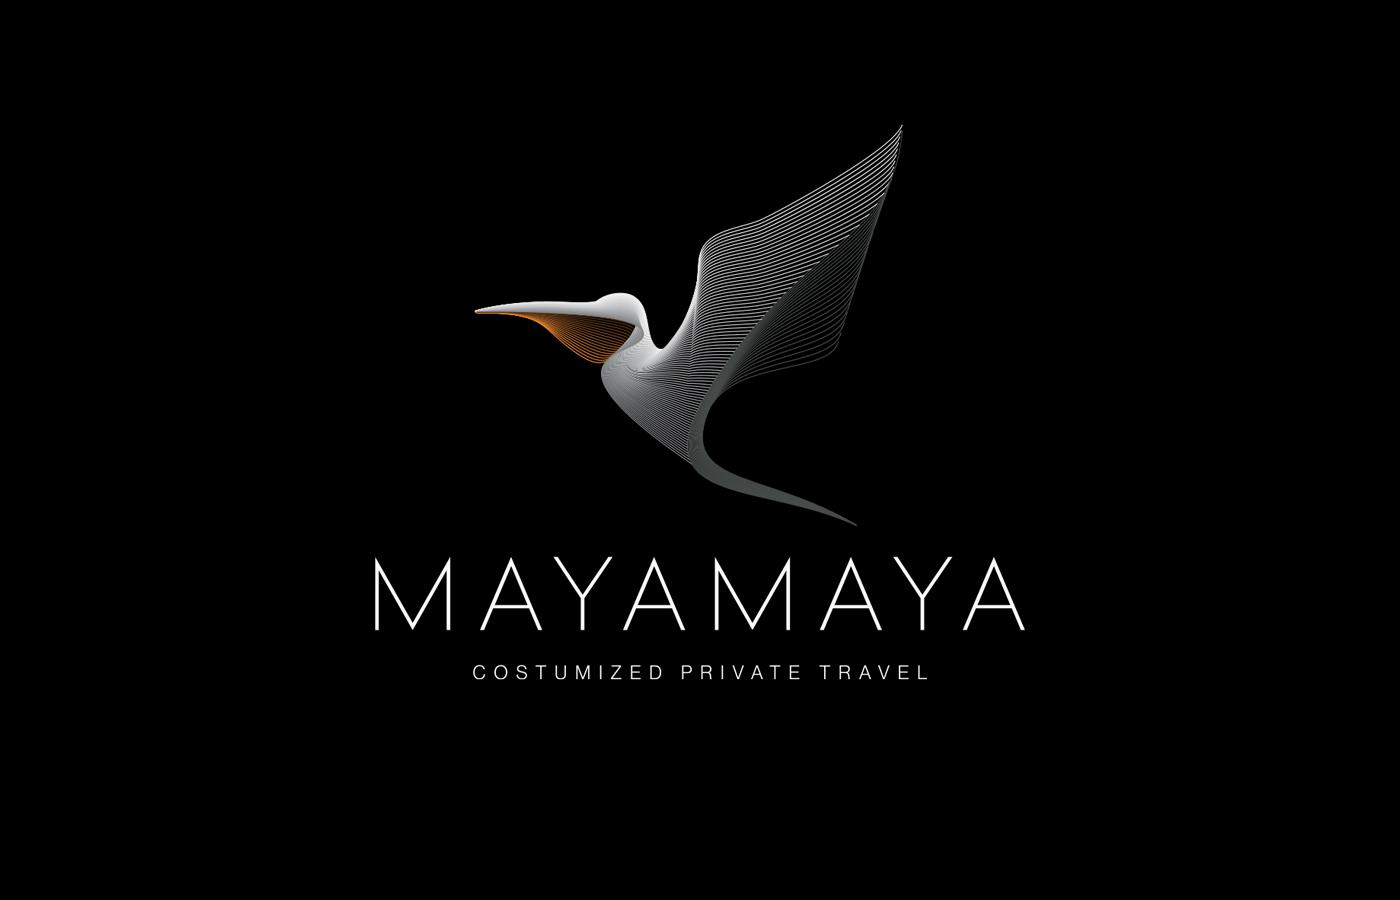 Mayamaya travel logo